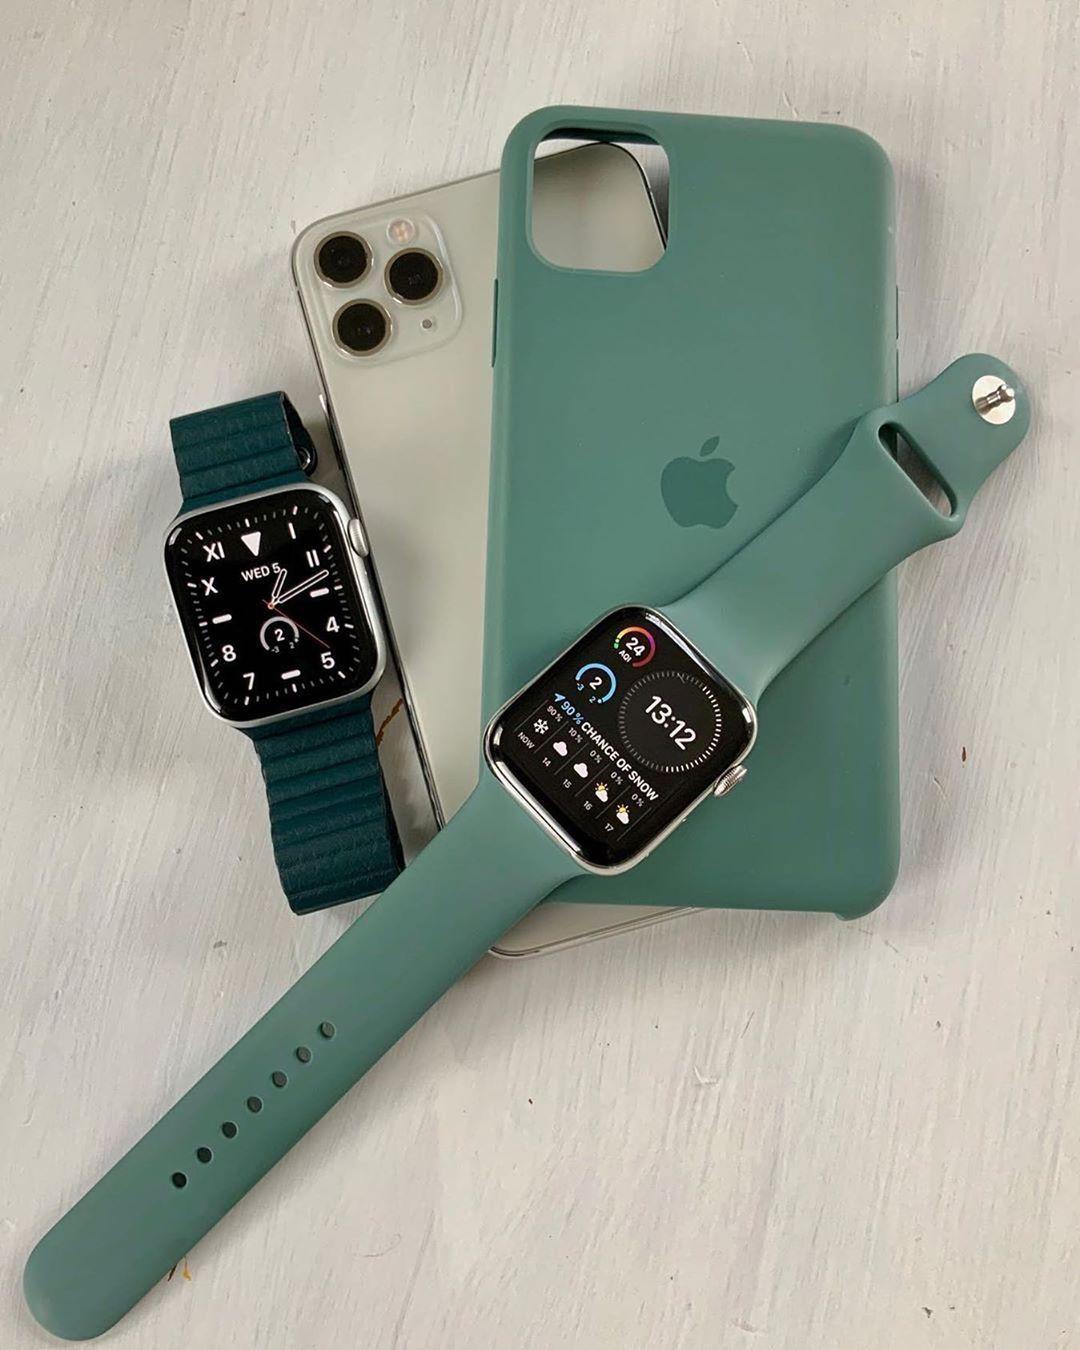 apple watch accessories in 2020 | Apple watch accessories, Apple watch silicone band, Apple watch iphone